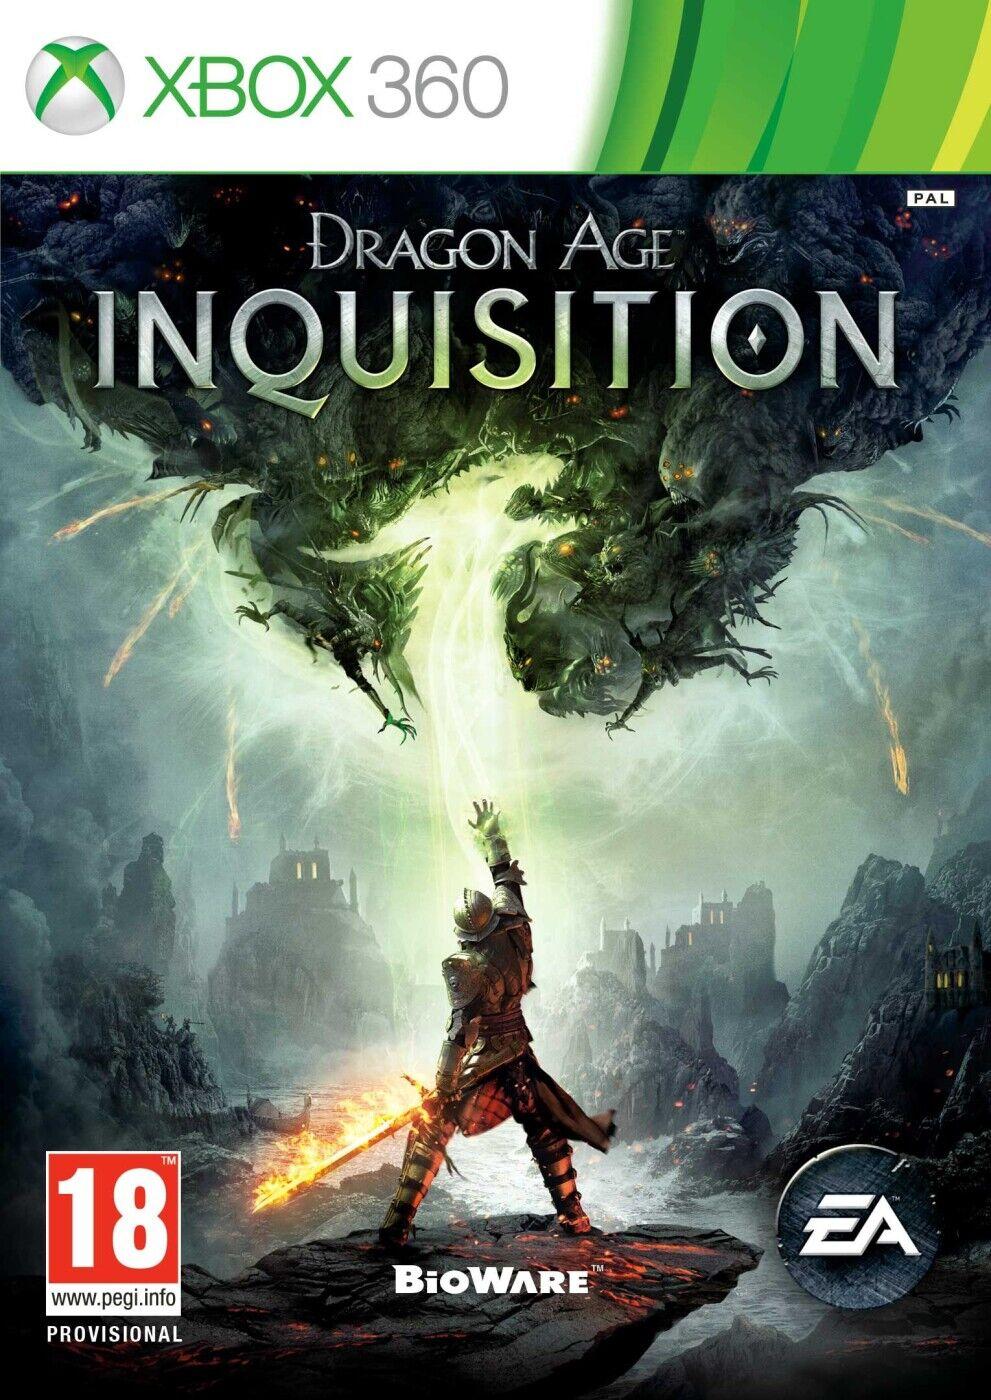 Dragon Age Iii (3): Inquisition - Xbox 360